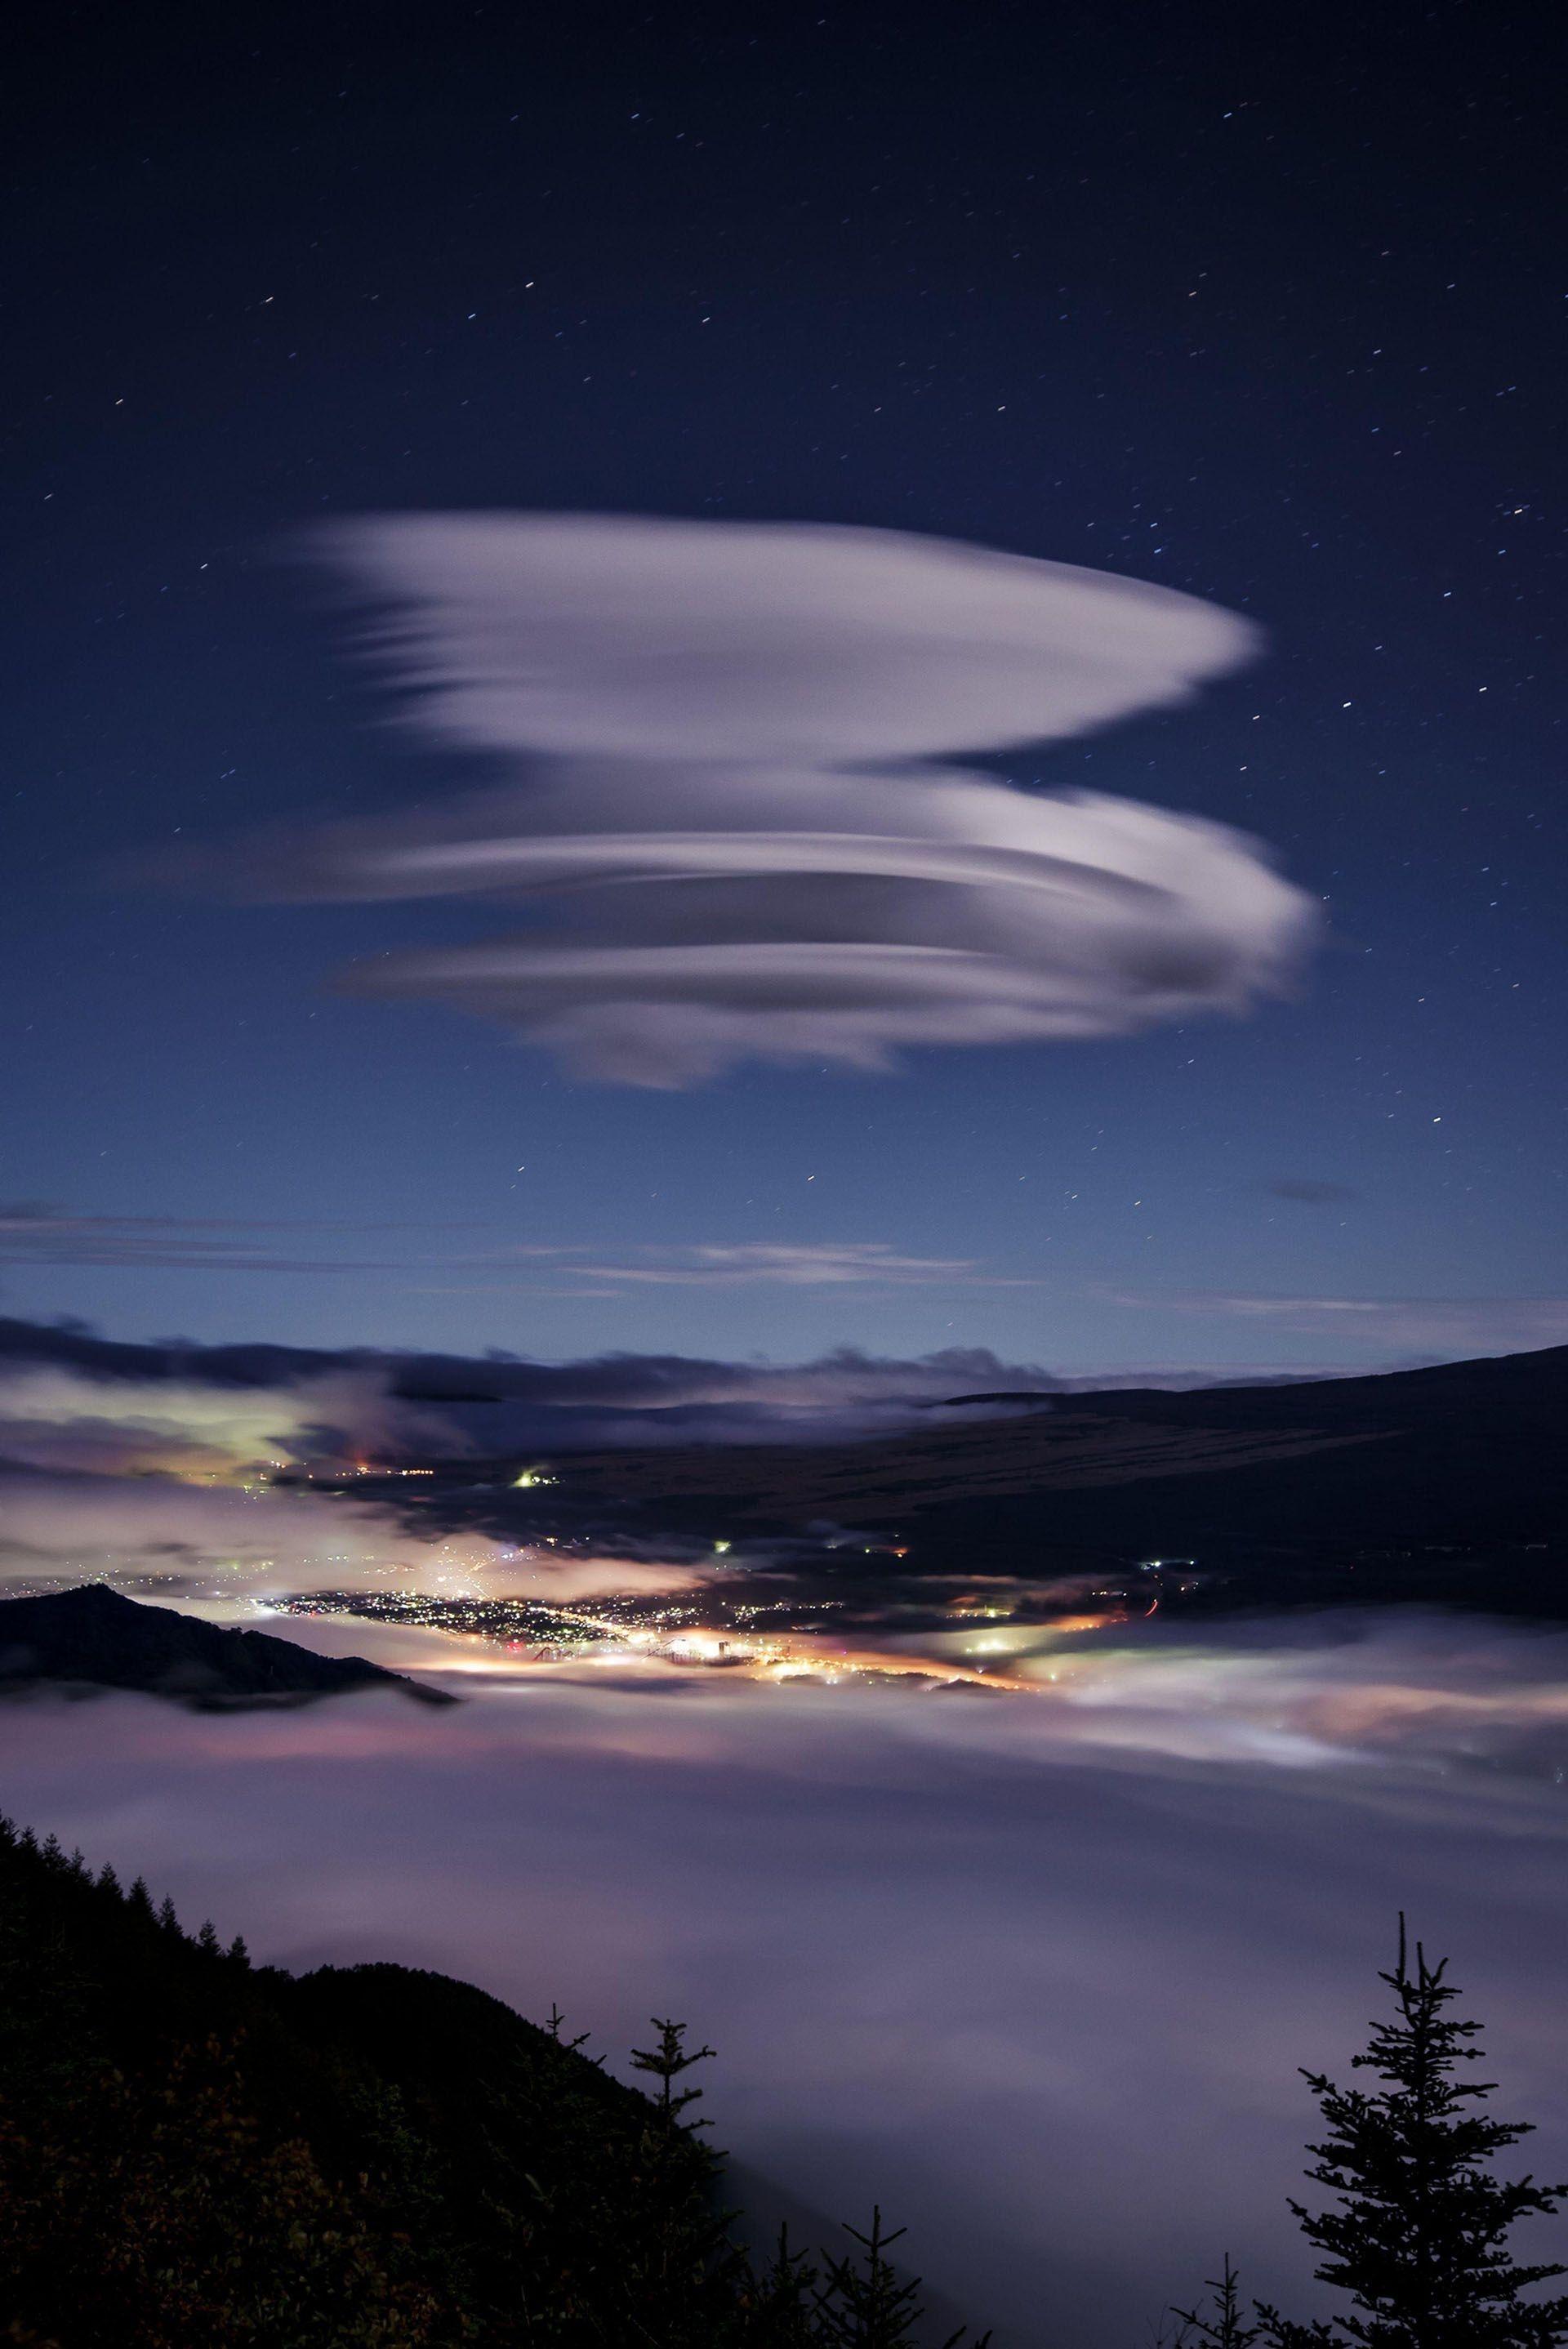 Photograph by  Yuga Kurita, National Geographic